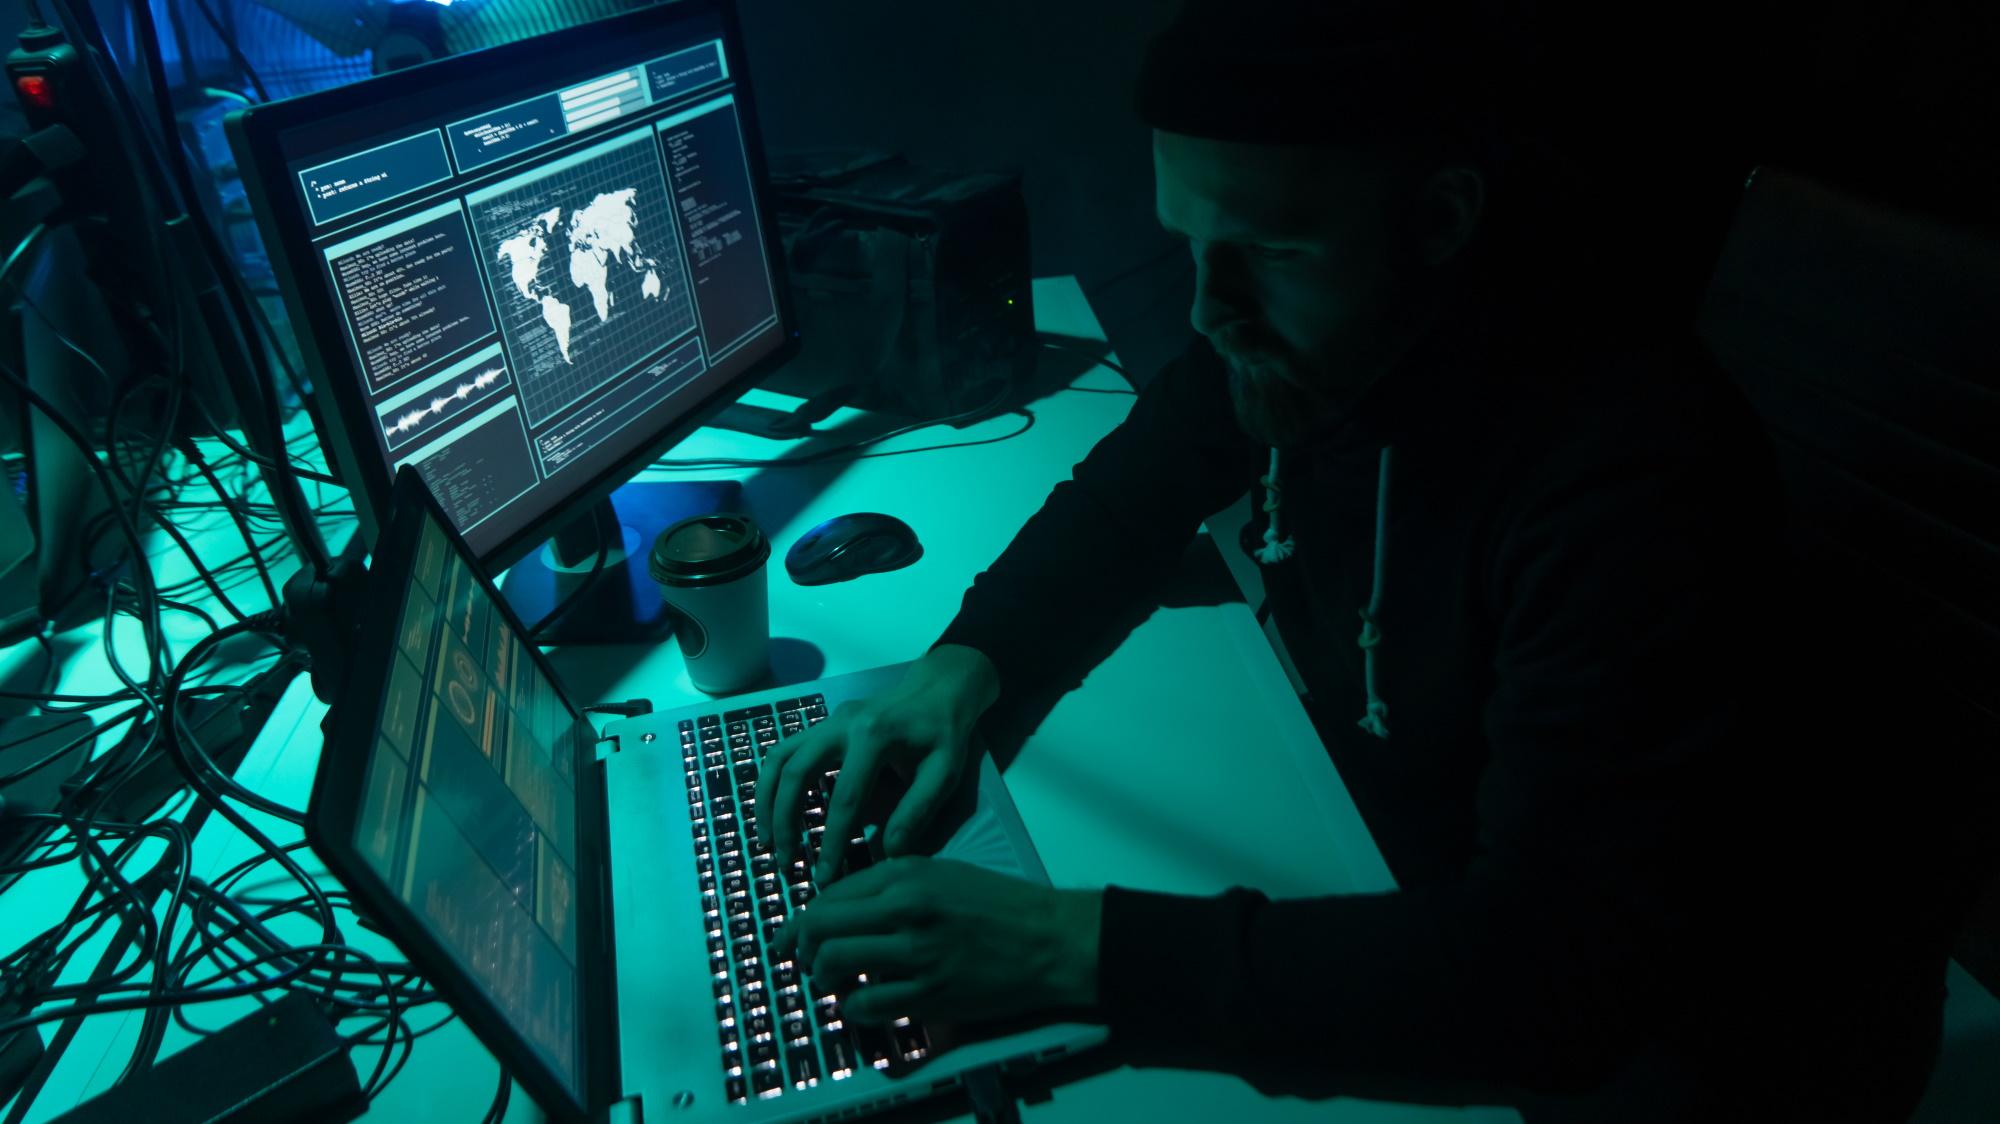 website audit - hacker working on laptop in darkened room